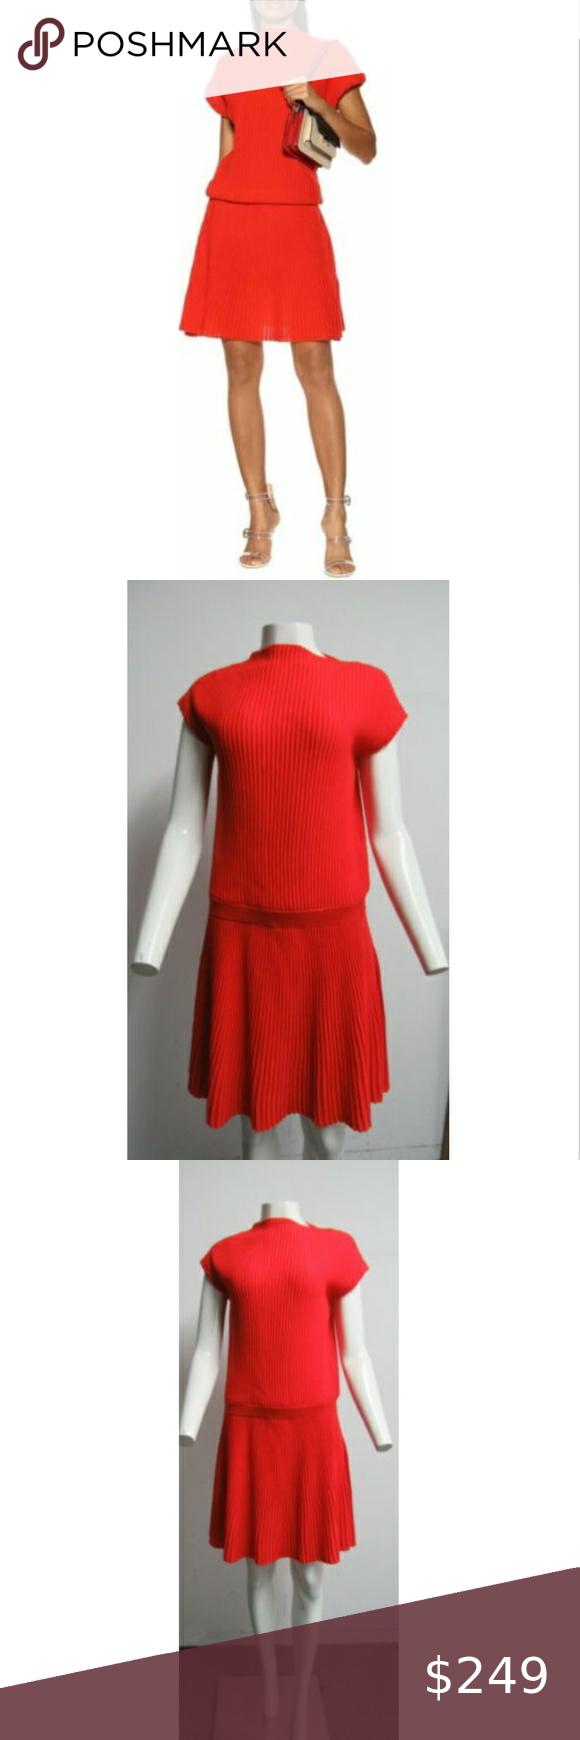 Victoria Victoria Beckham Red Knit Dress Sz 6 Victoria Victoria Beckham Red Ribbed Knit Dress Size 6 Featuring A S Red Knit Dress Knit Dress Ribbed Knit Dress [ 1740 x 580 Pixel ]